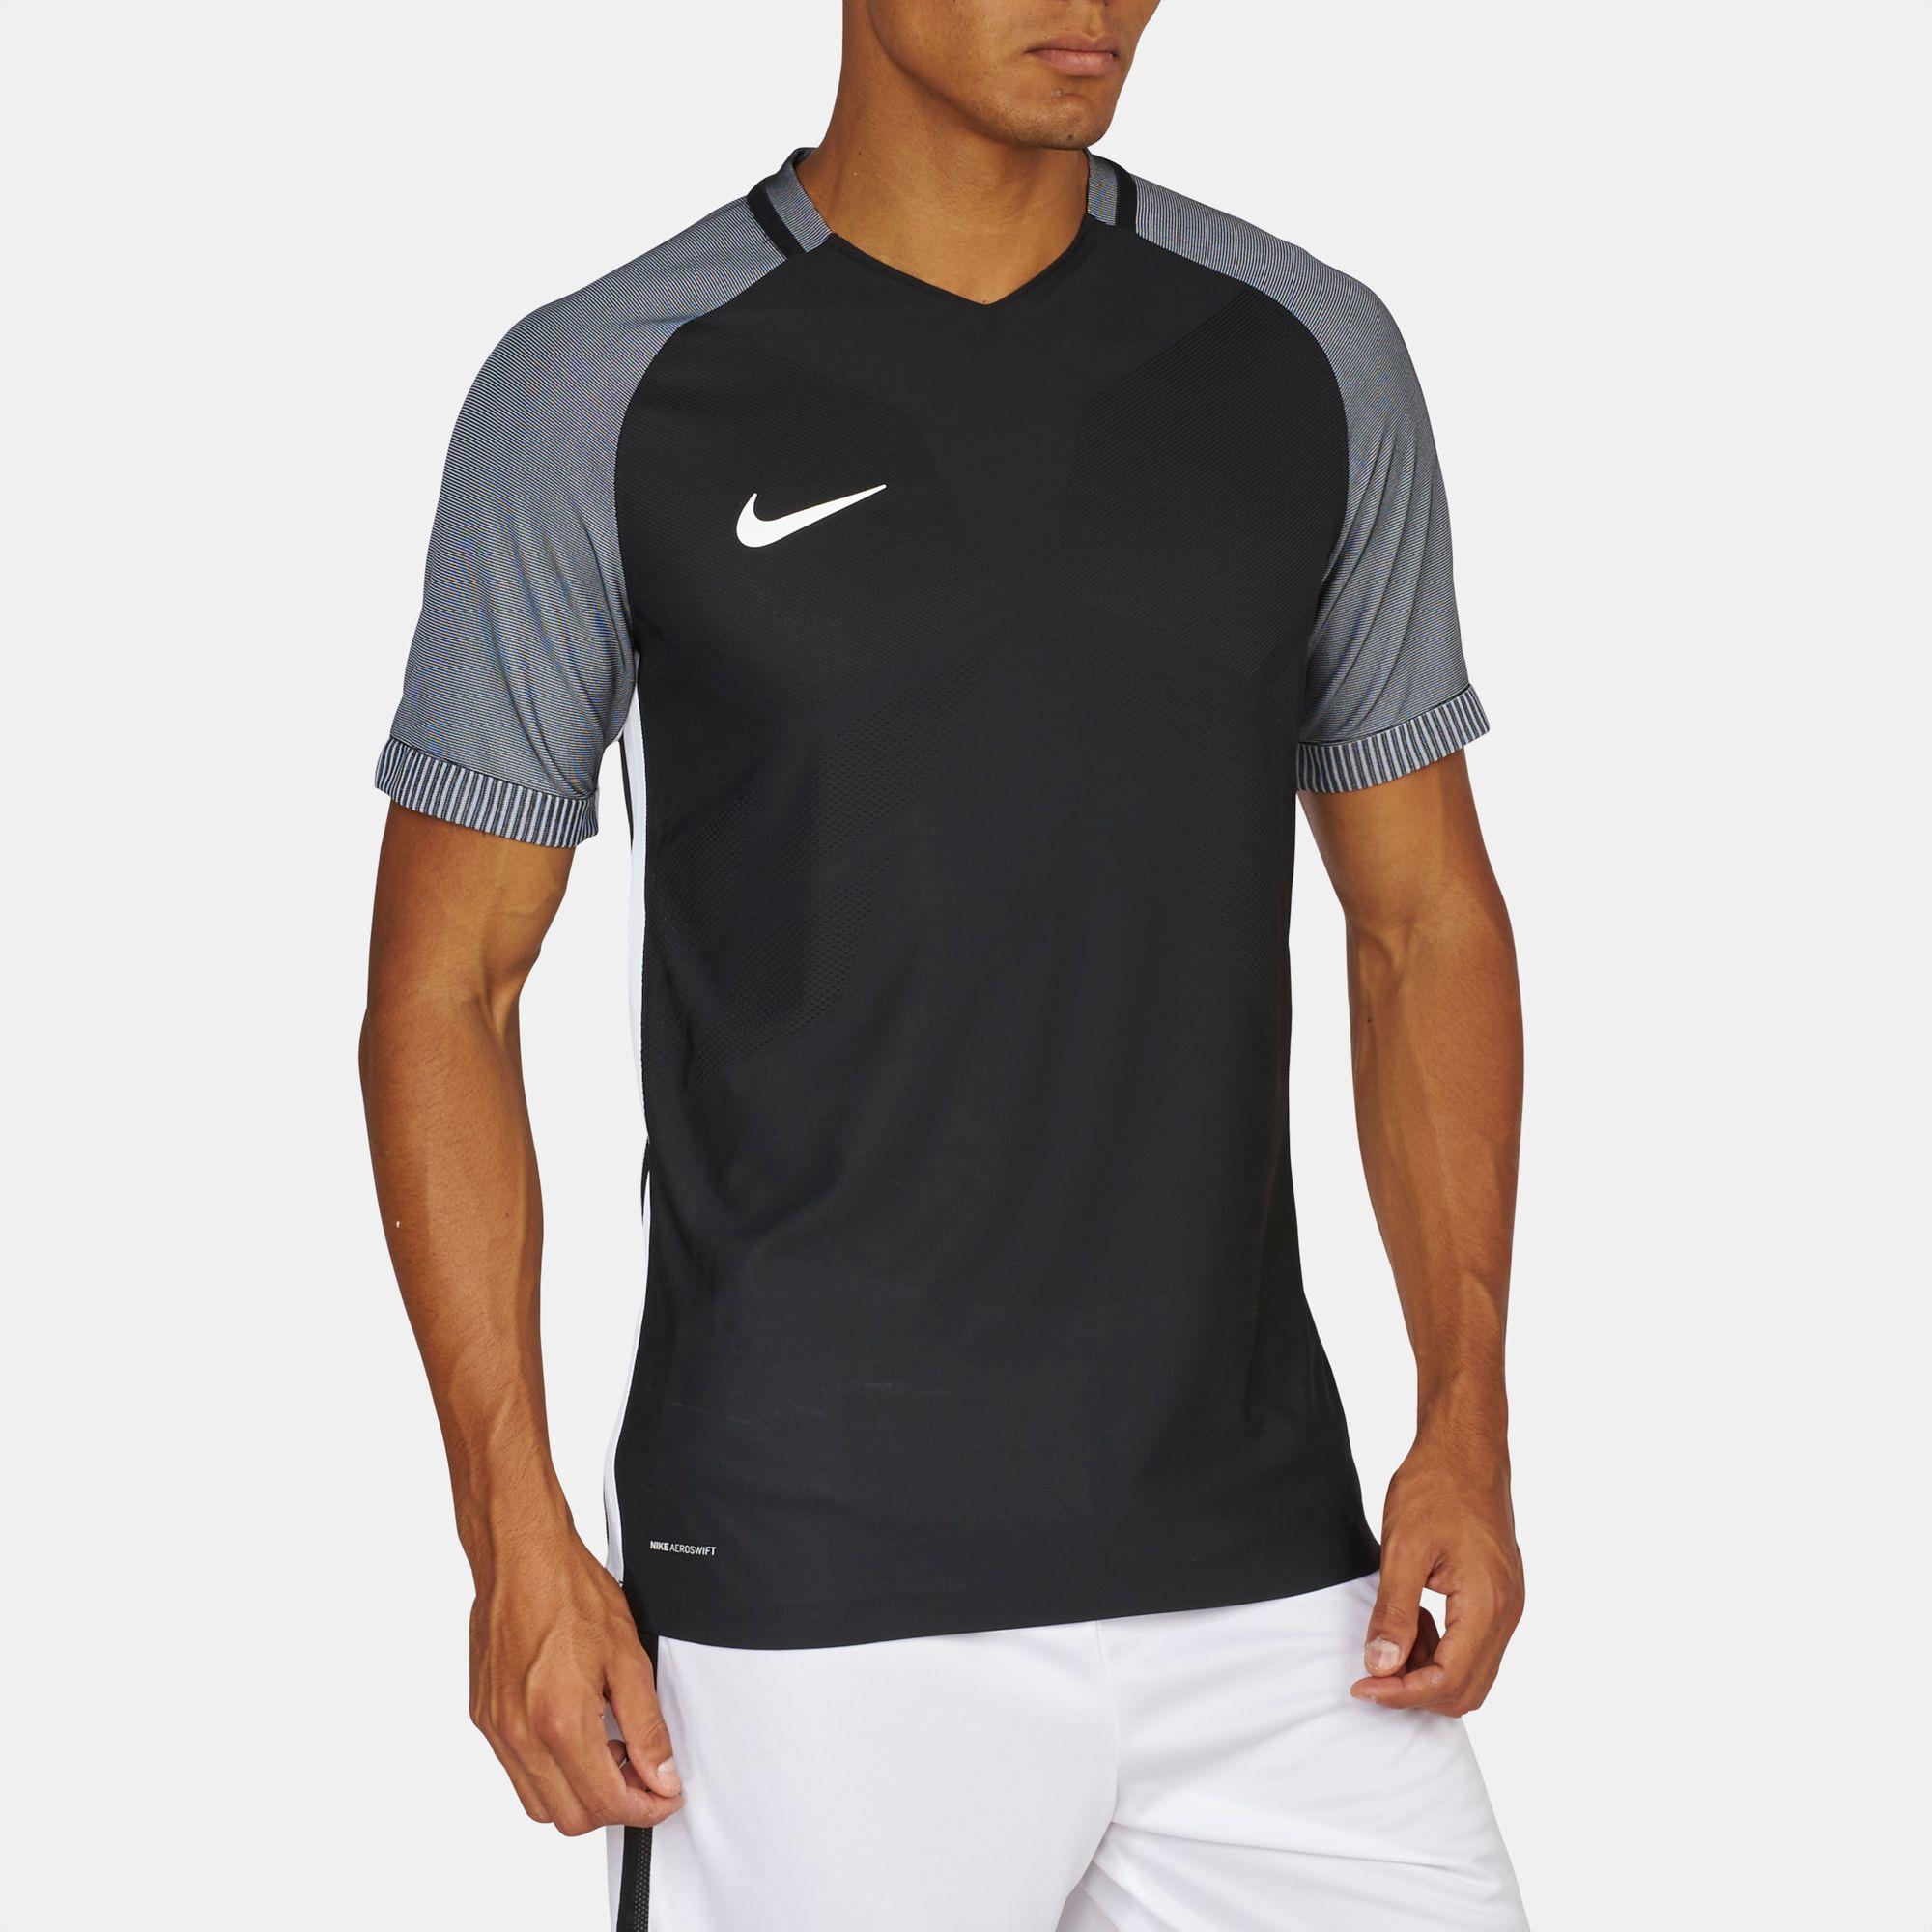 bf0fc884 Shop Black Nike Aeroswift Strike Short Sleeve T-Shirt for Mens by ...